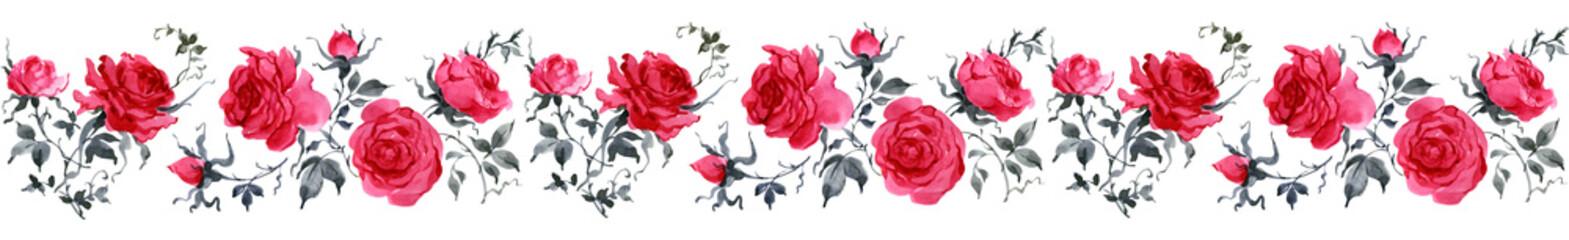 Watercolor Roses seamless border virginia